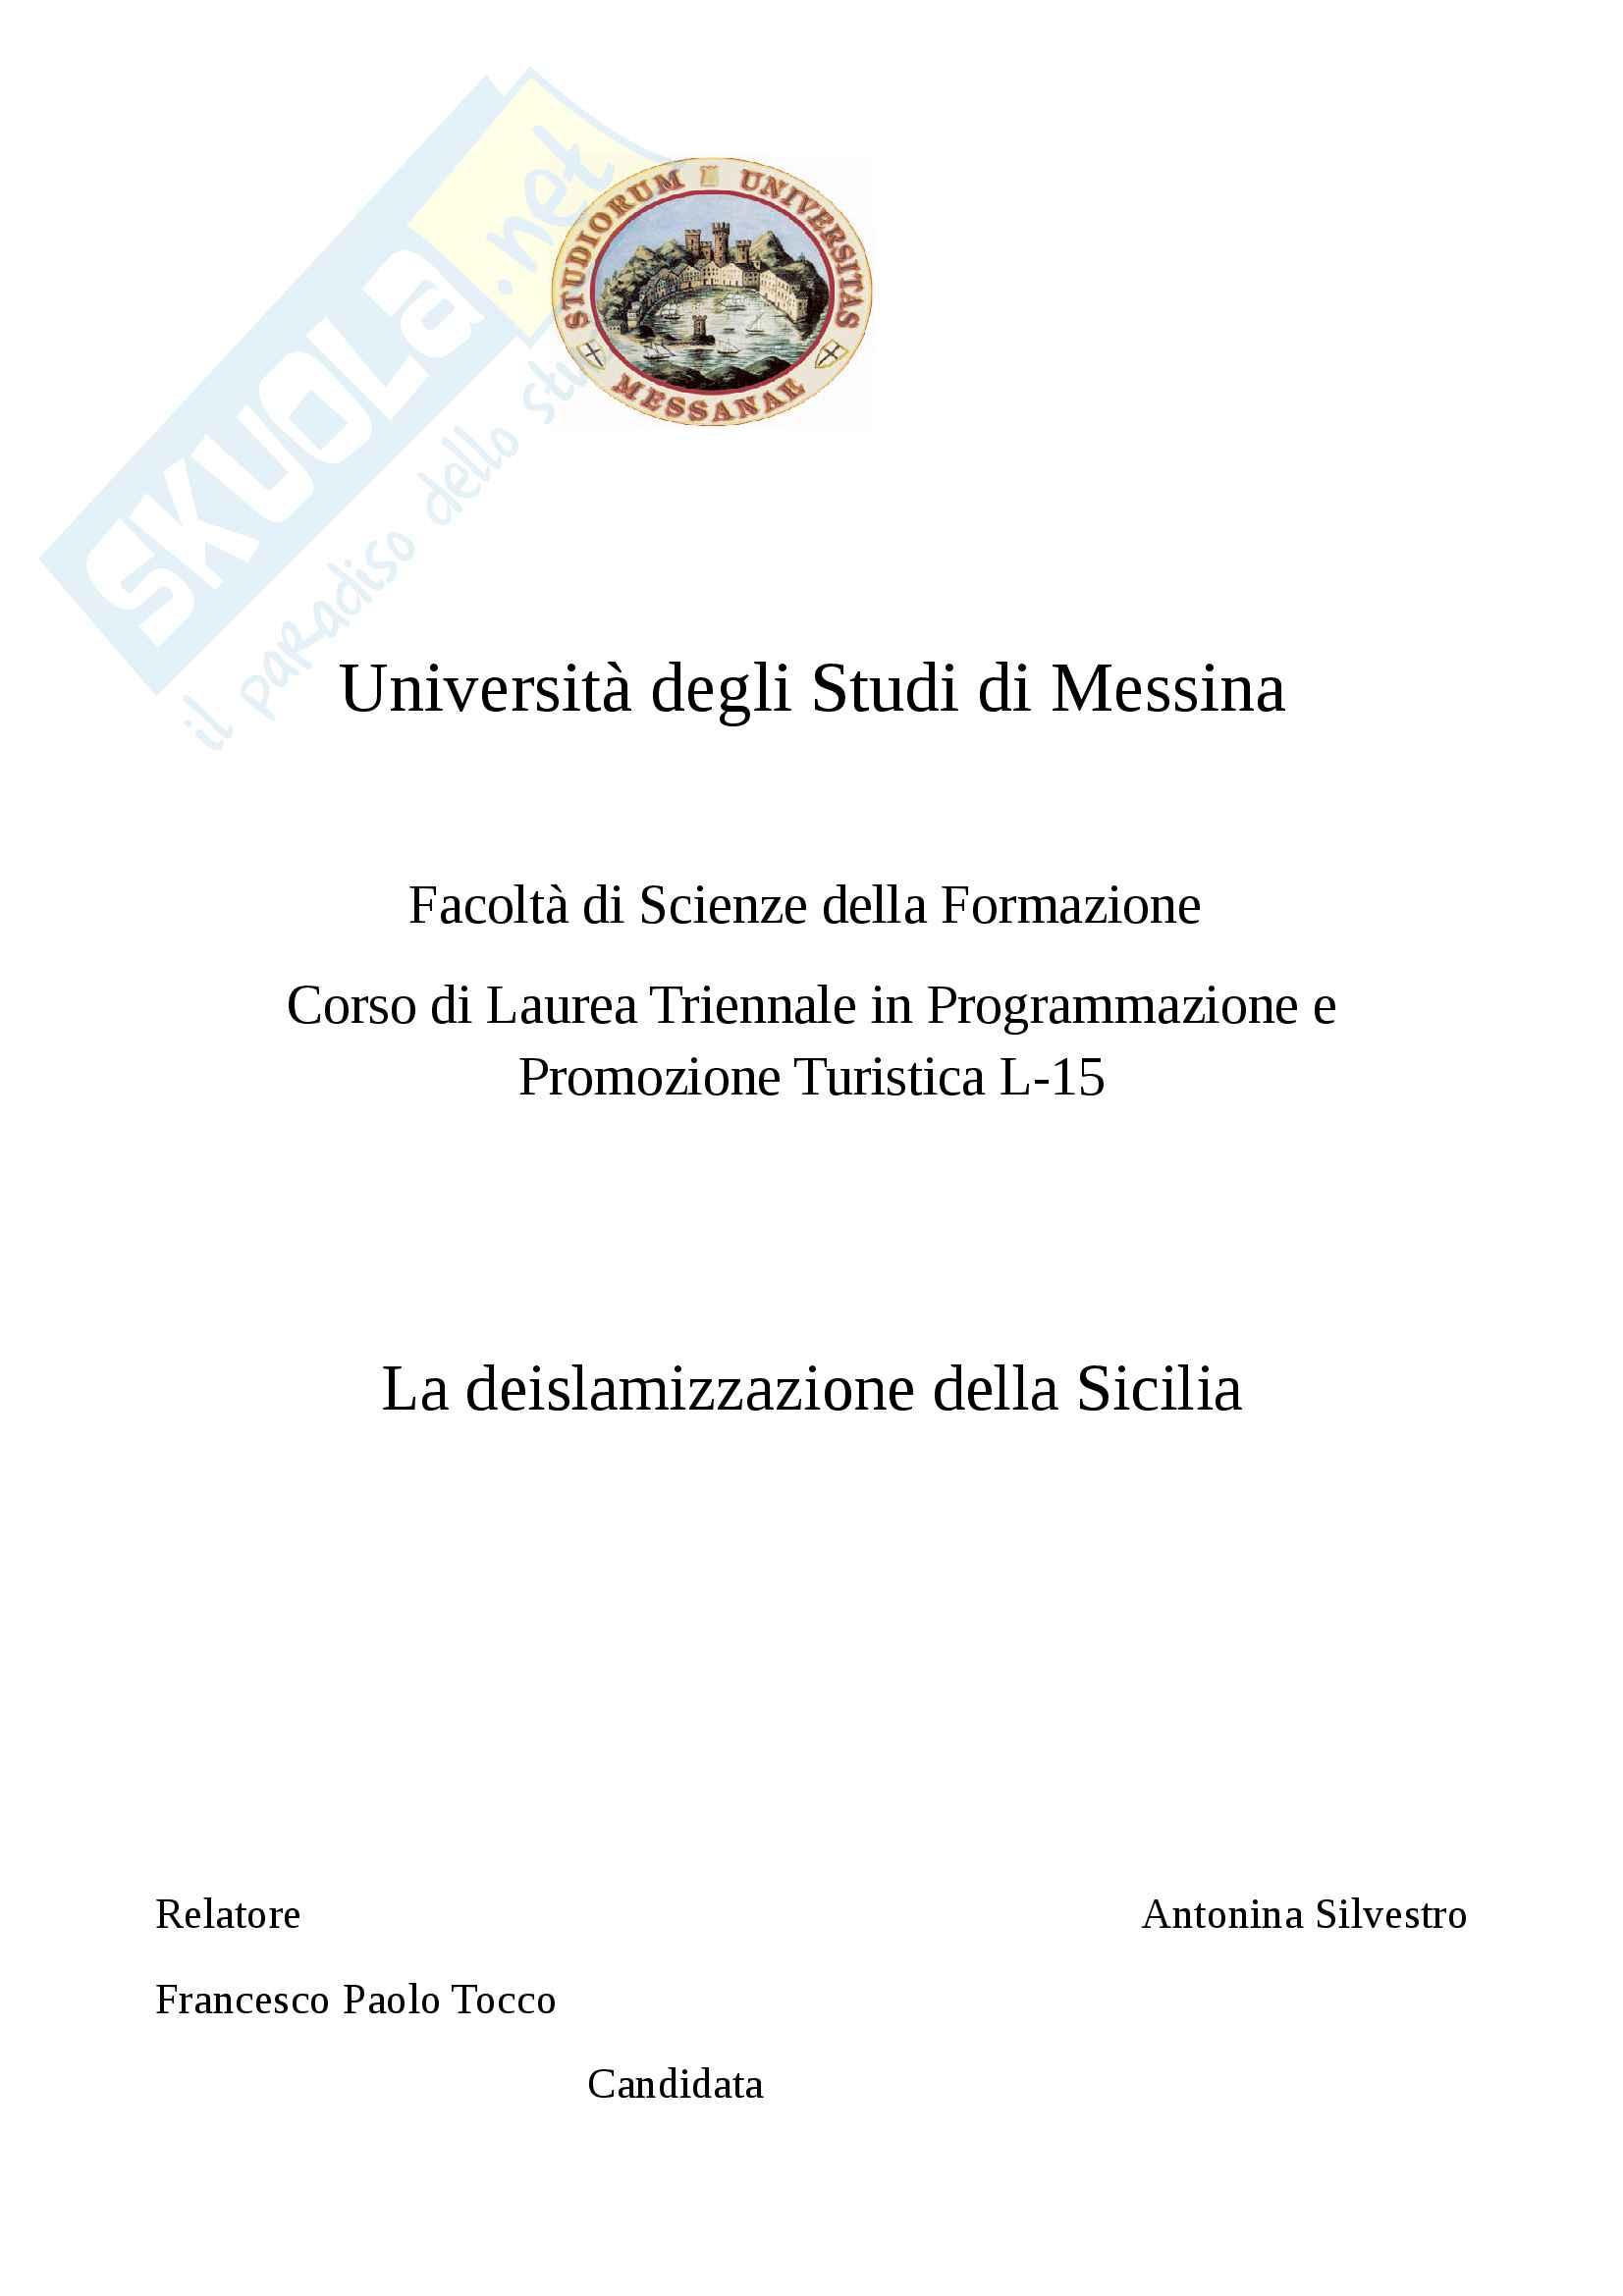 tesi F. Tocco Storia medievale